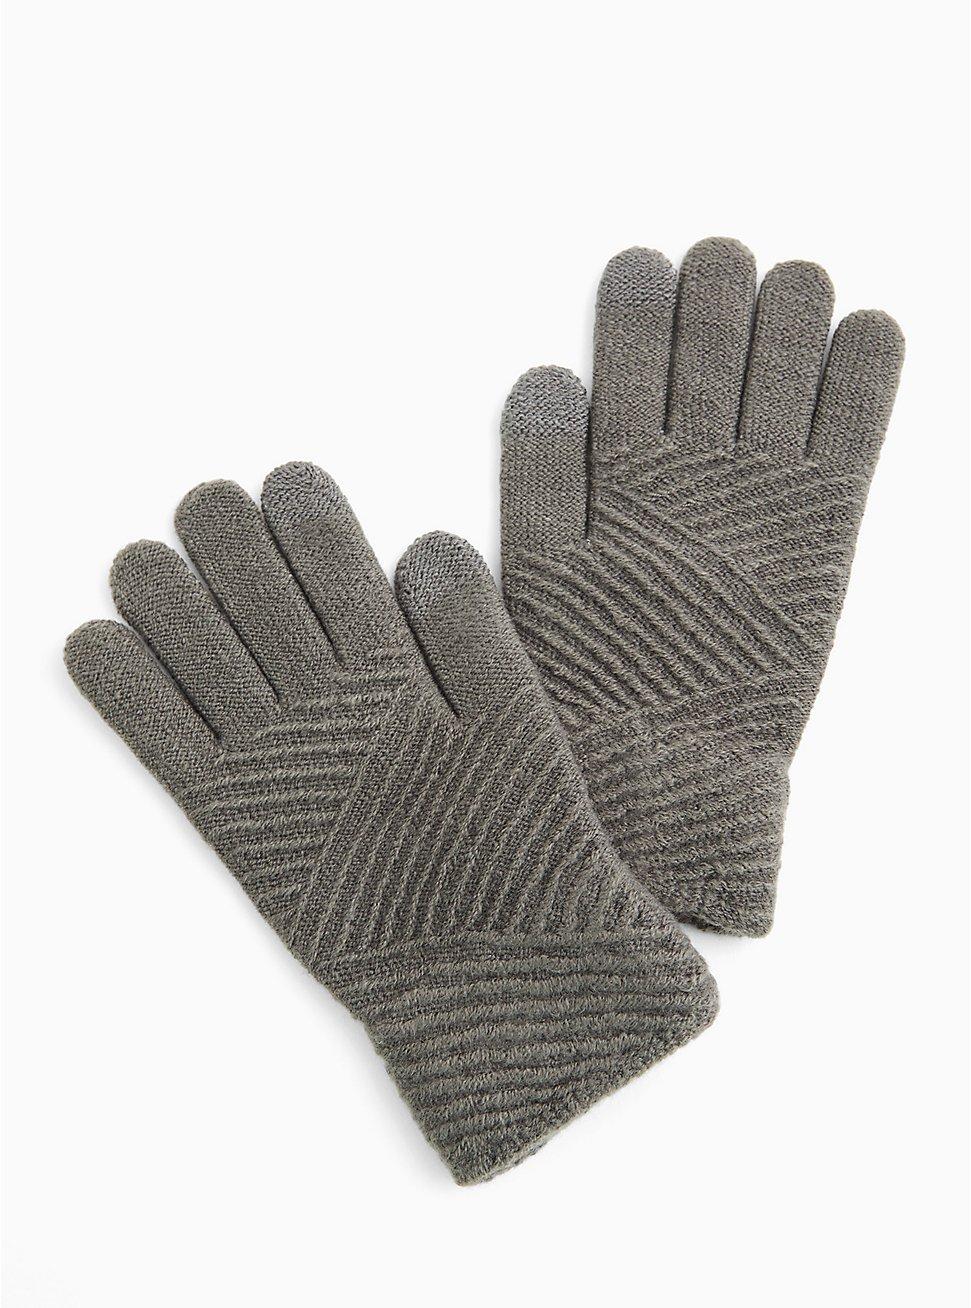 Charcoal Grey Texting Gloves, , hi-res